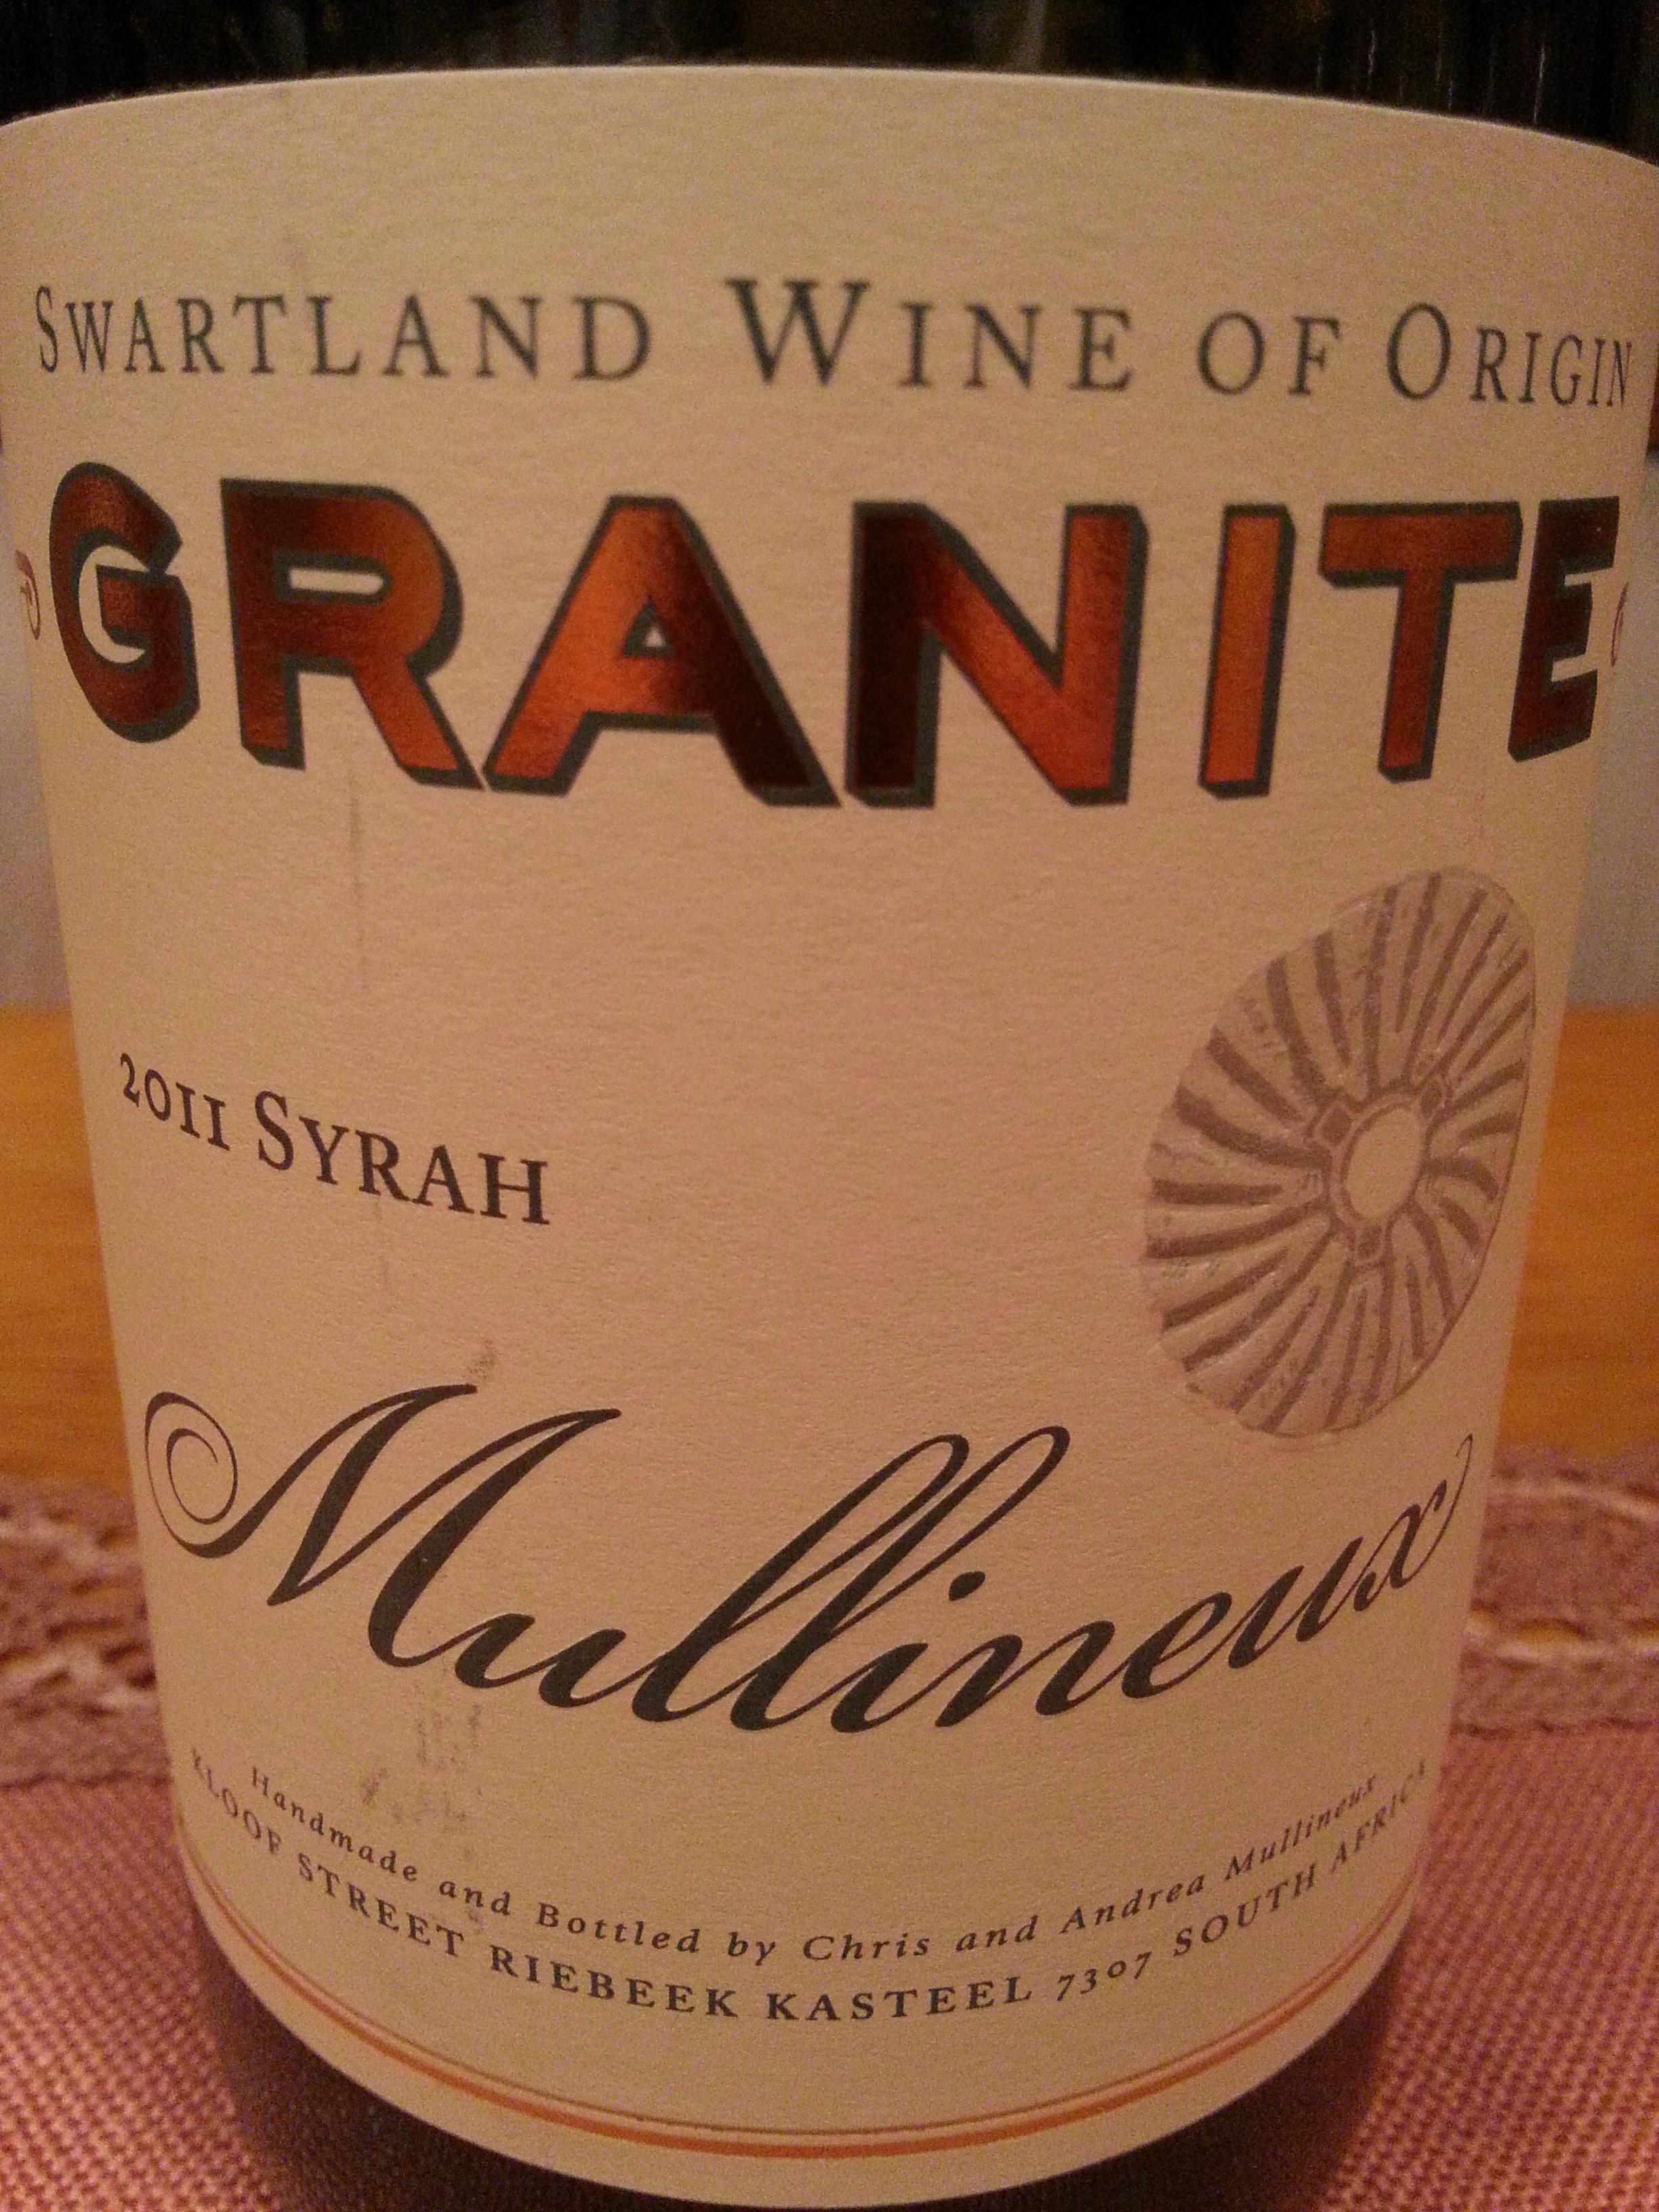 2011 Syrah Granite | Mullineux